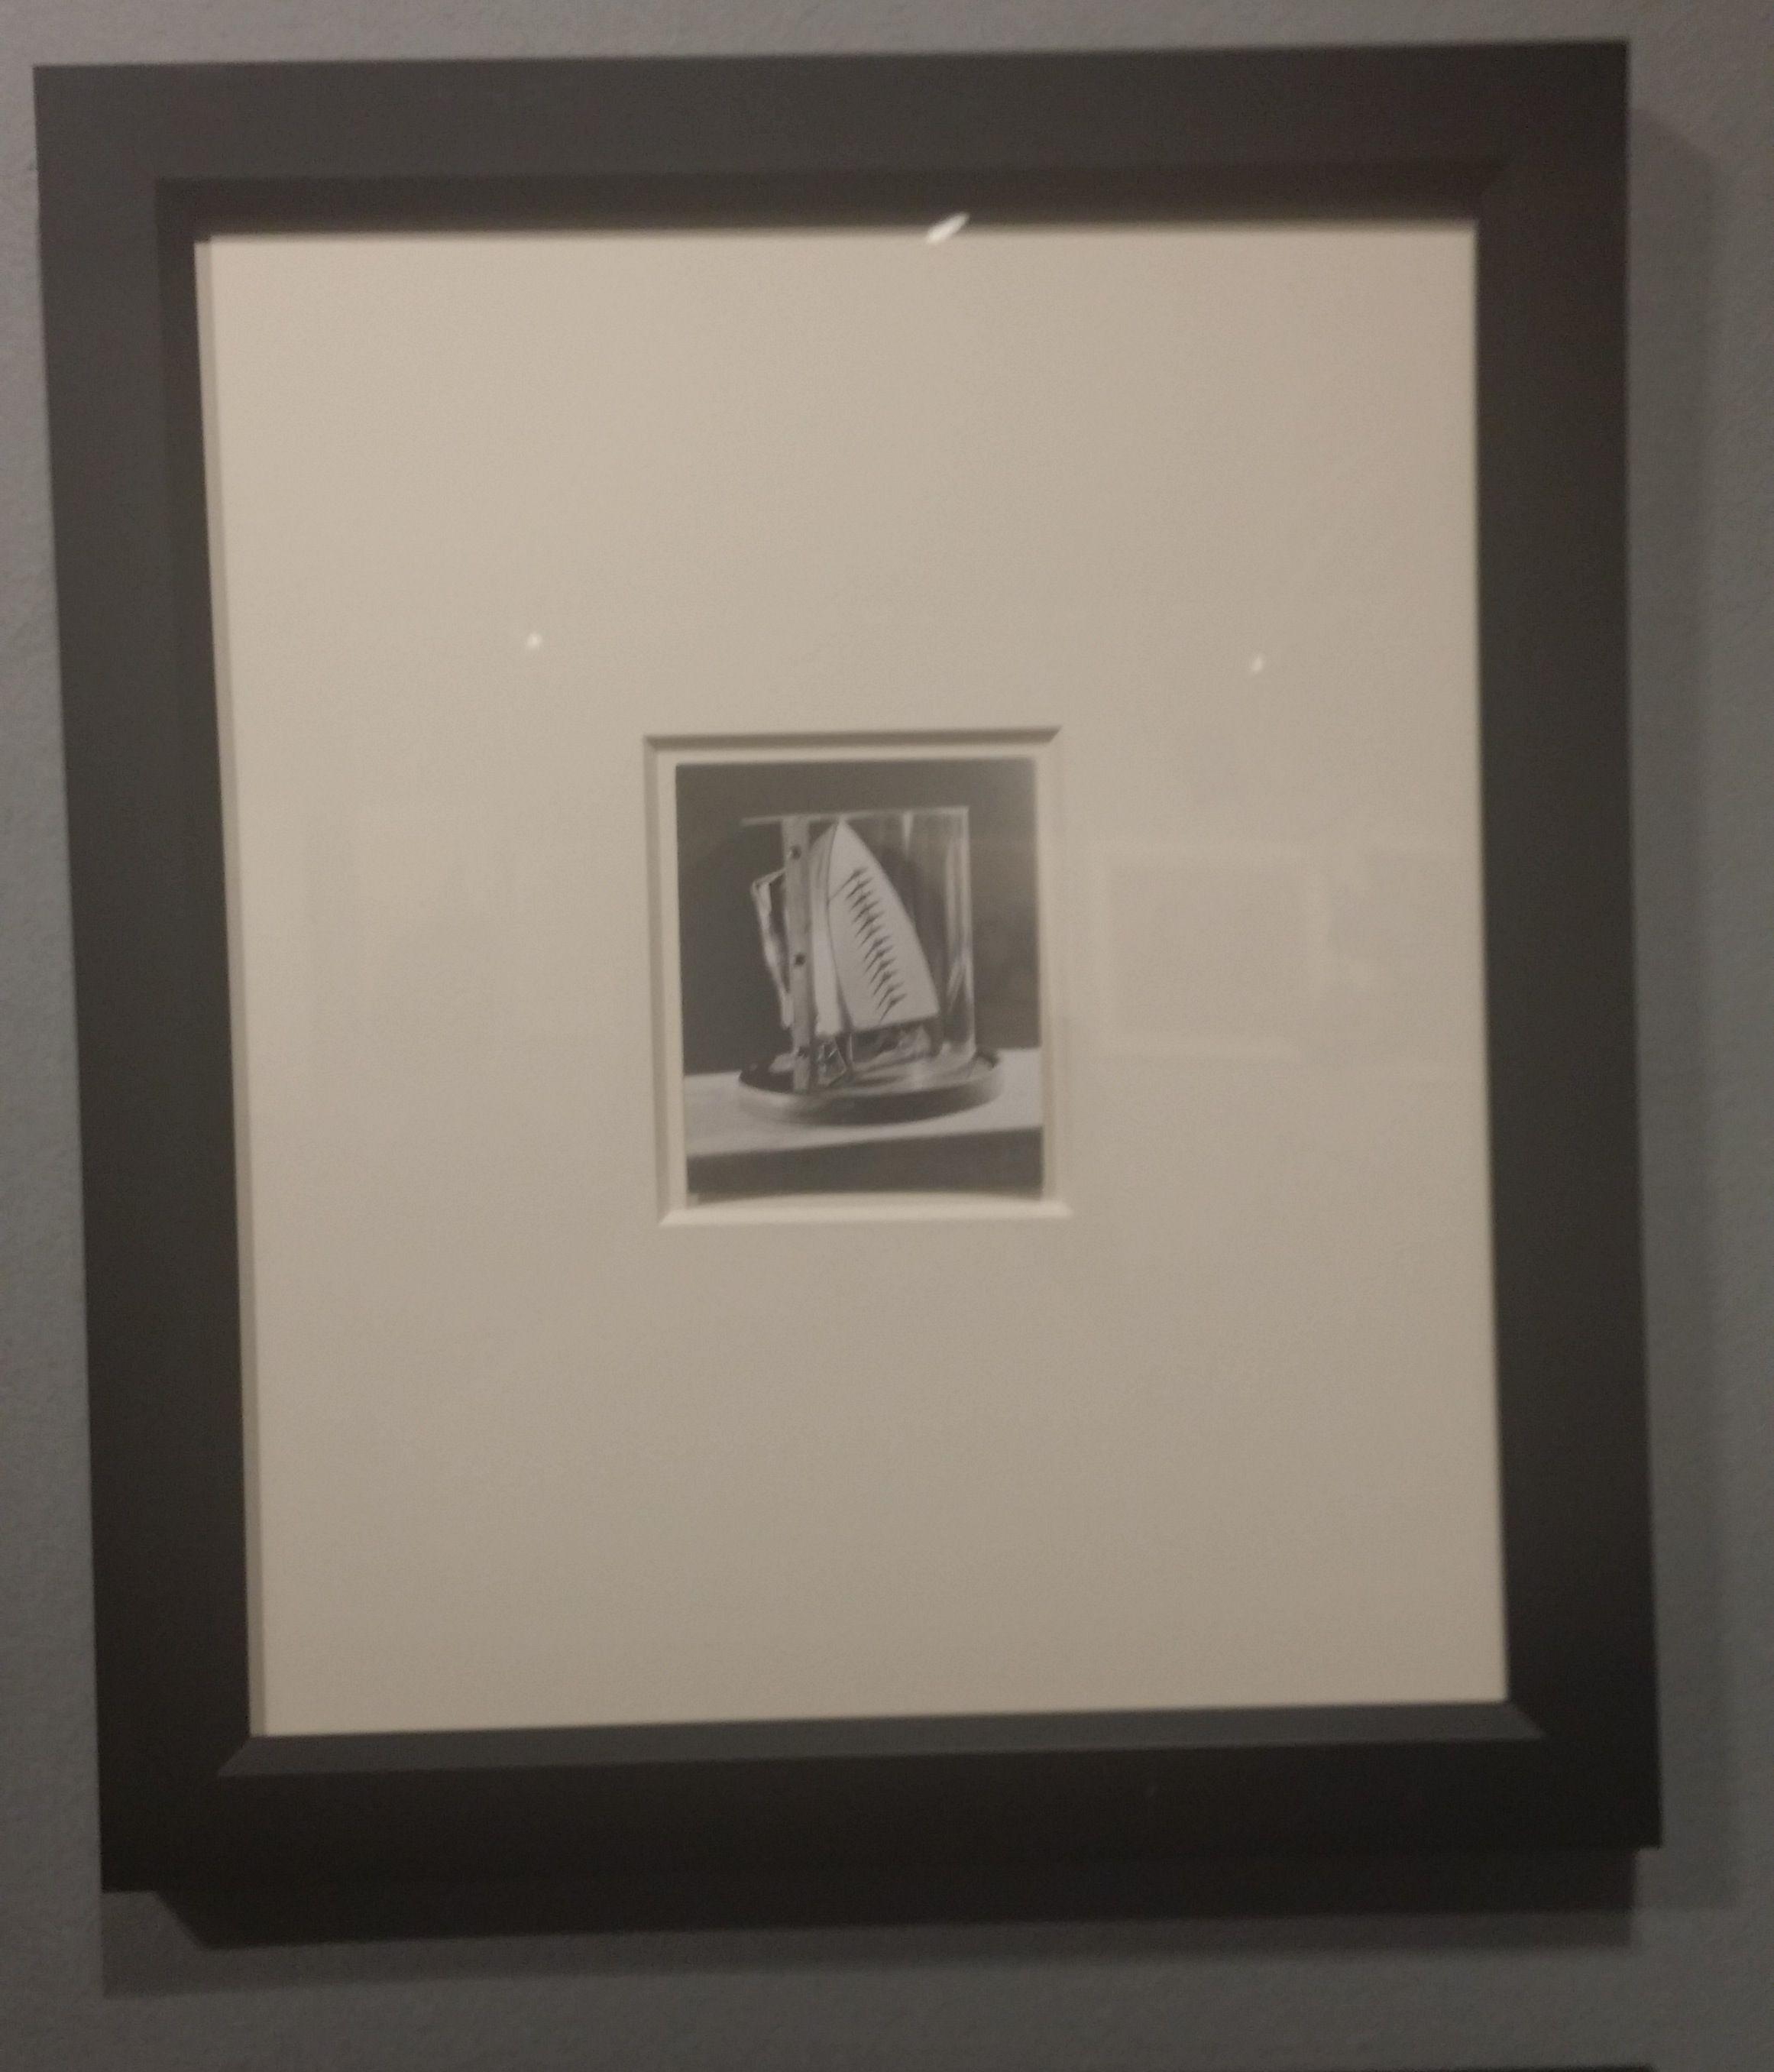 Frame profile: floater frame / box frame for a work on canvas ...